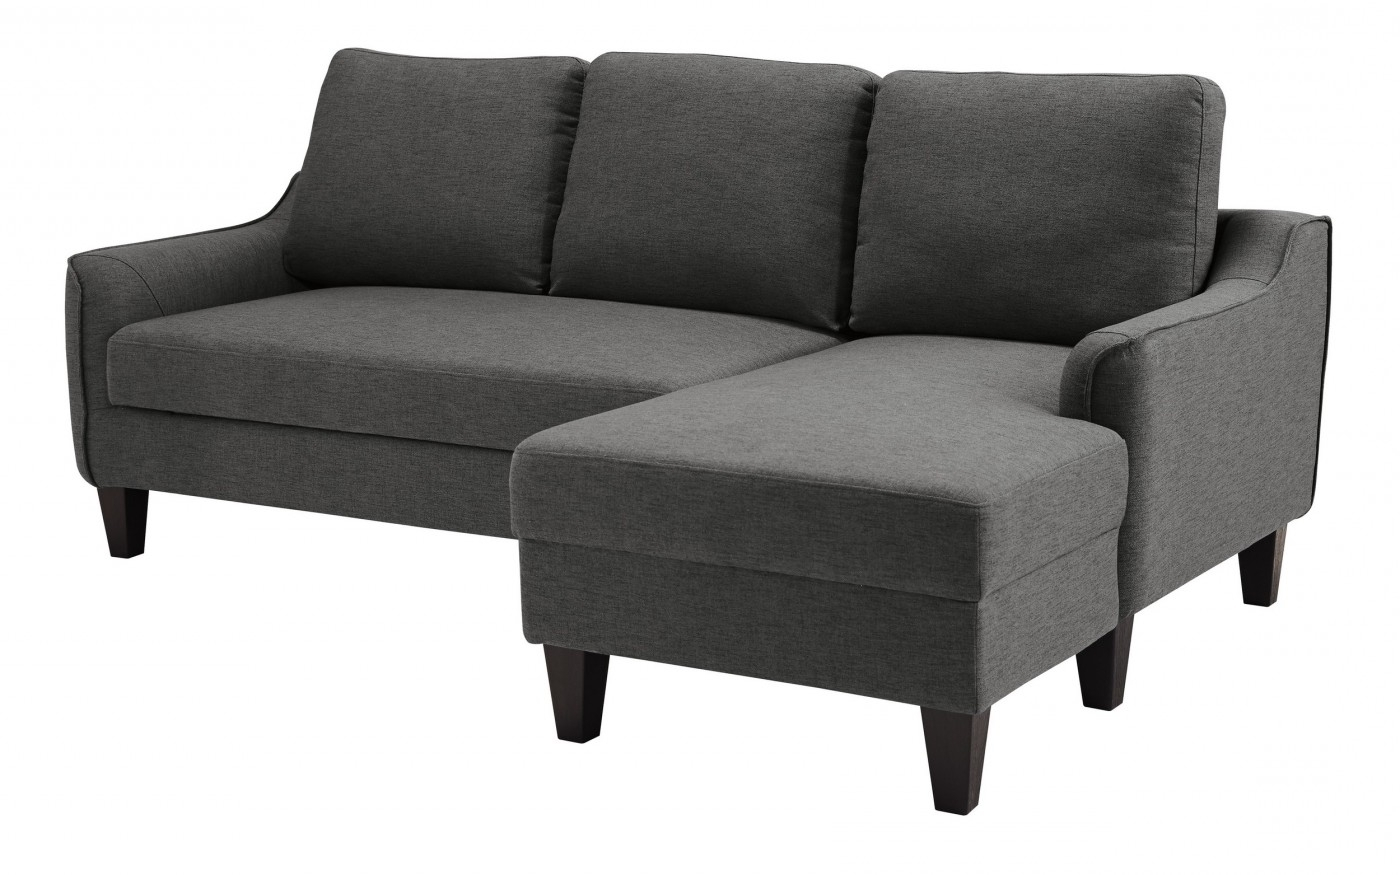 Signature Designashley Jarreau Gray Sofa Chaise Sleeper With Most Popular Sofa Chaise Sleepers (View 15 of 15)